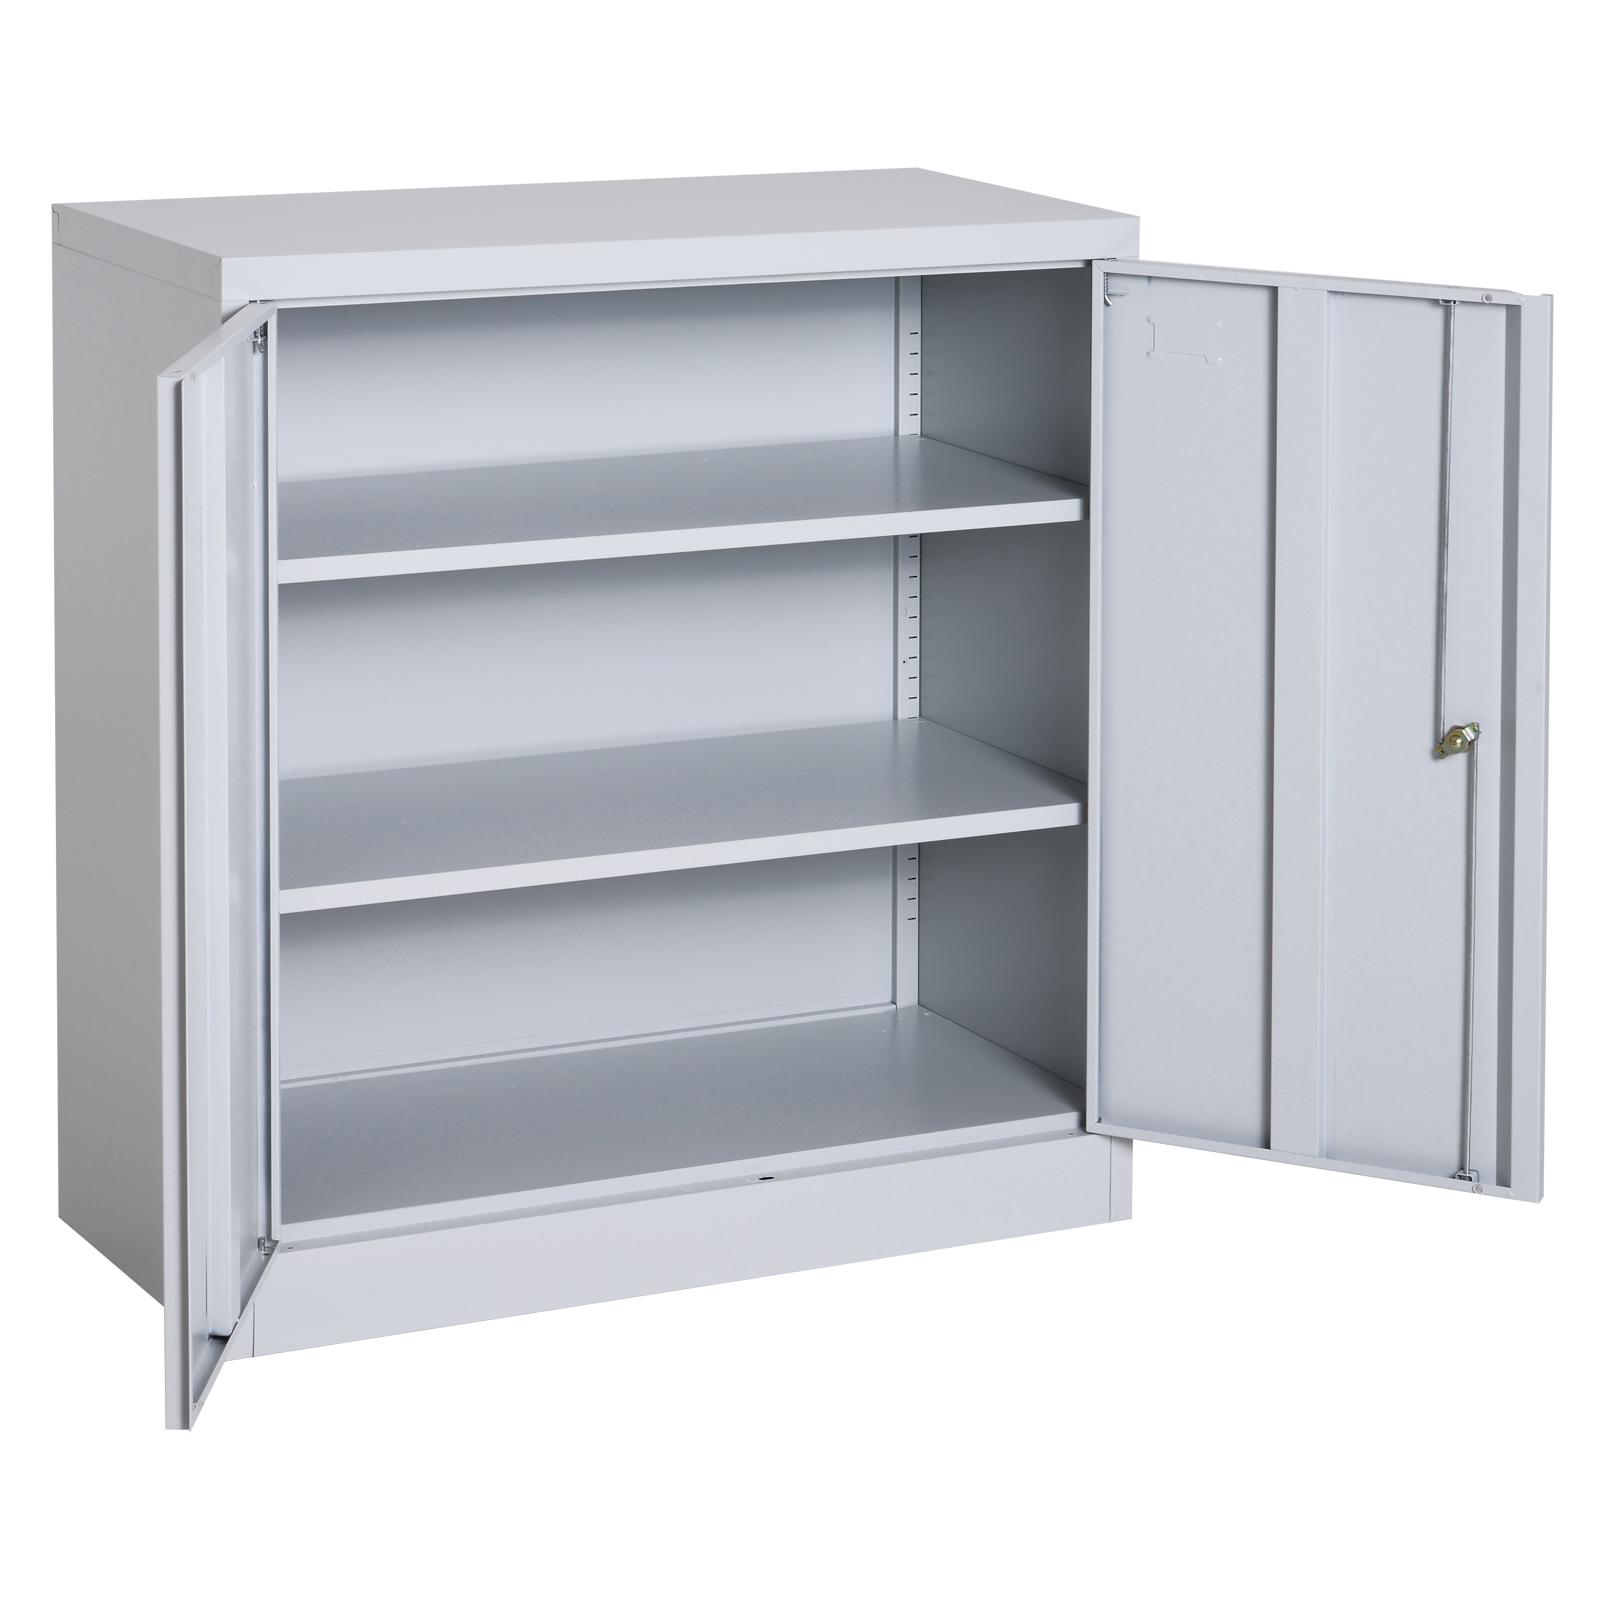 36 Freestanding Steel Utility Storage Cabinet Bookcase